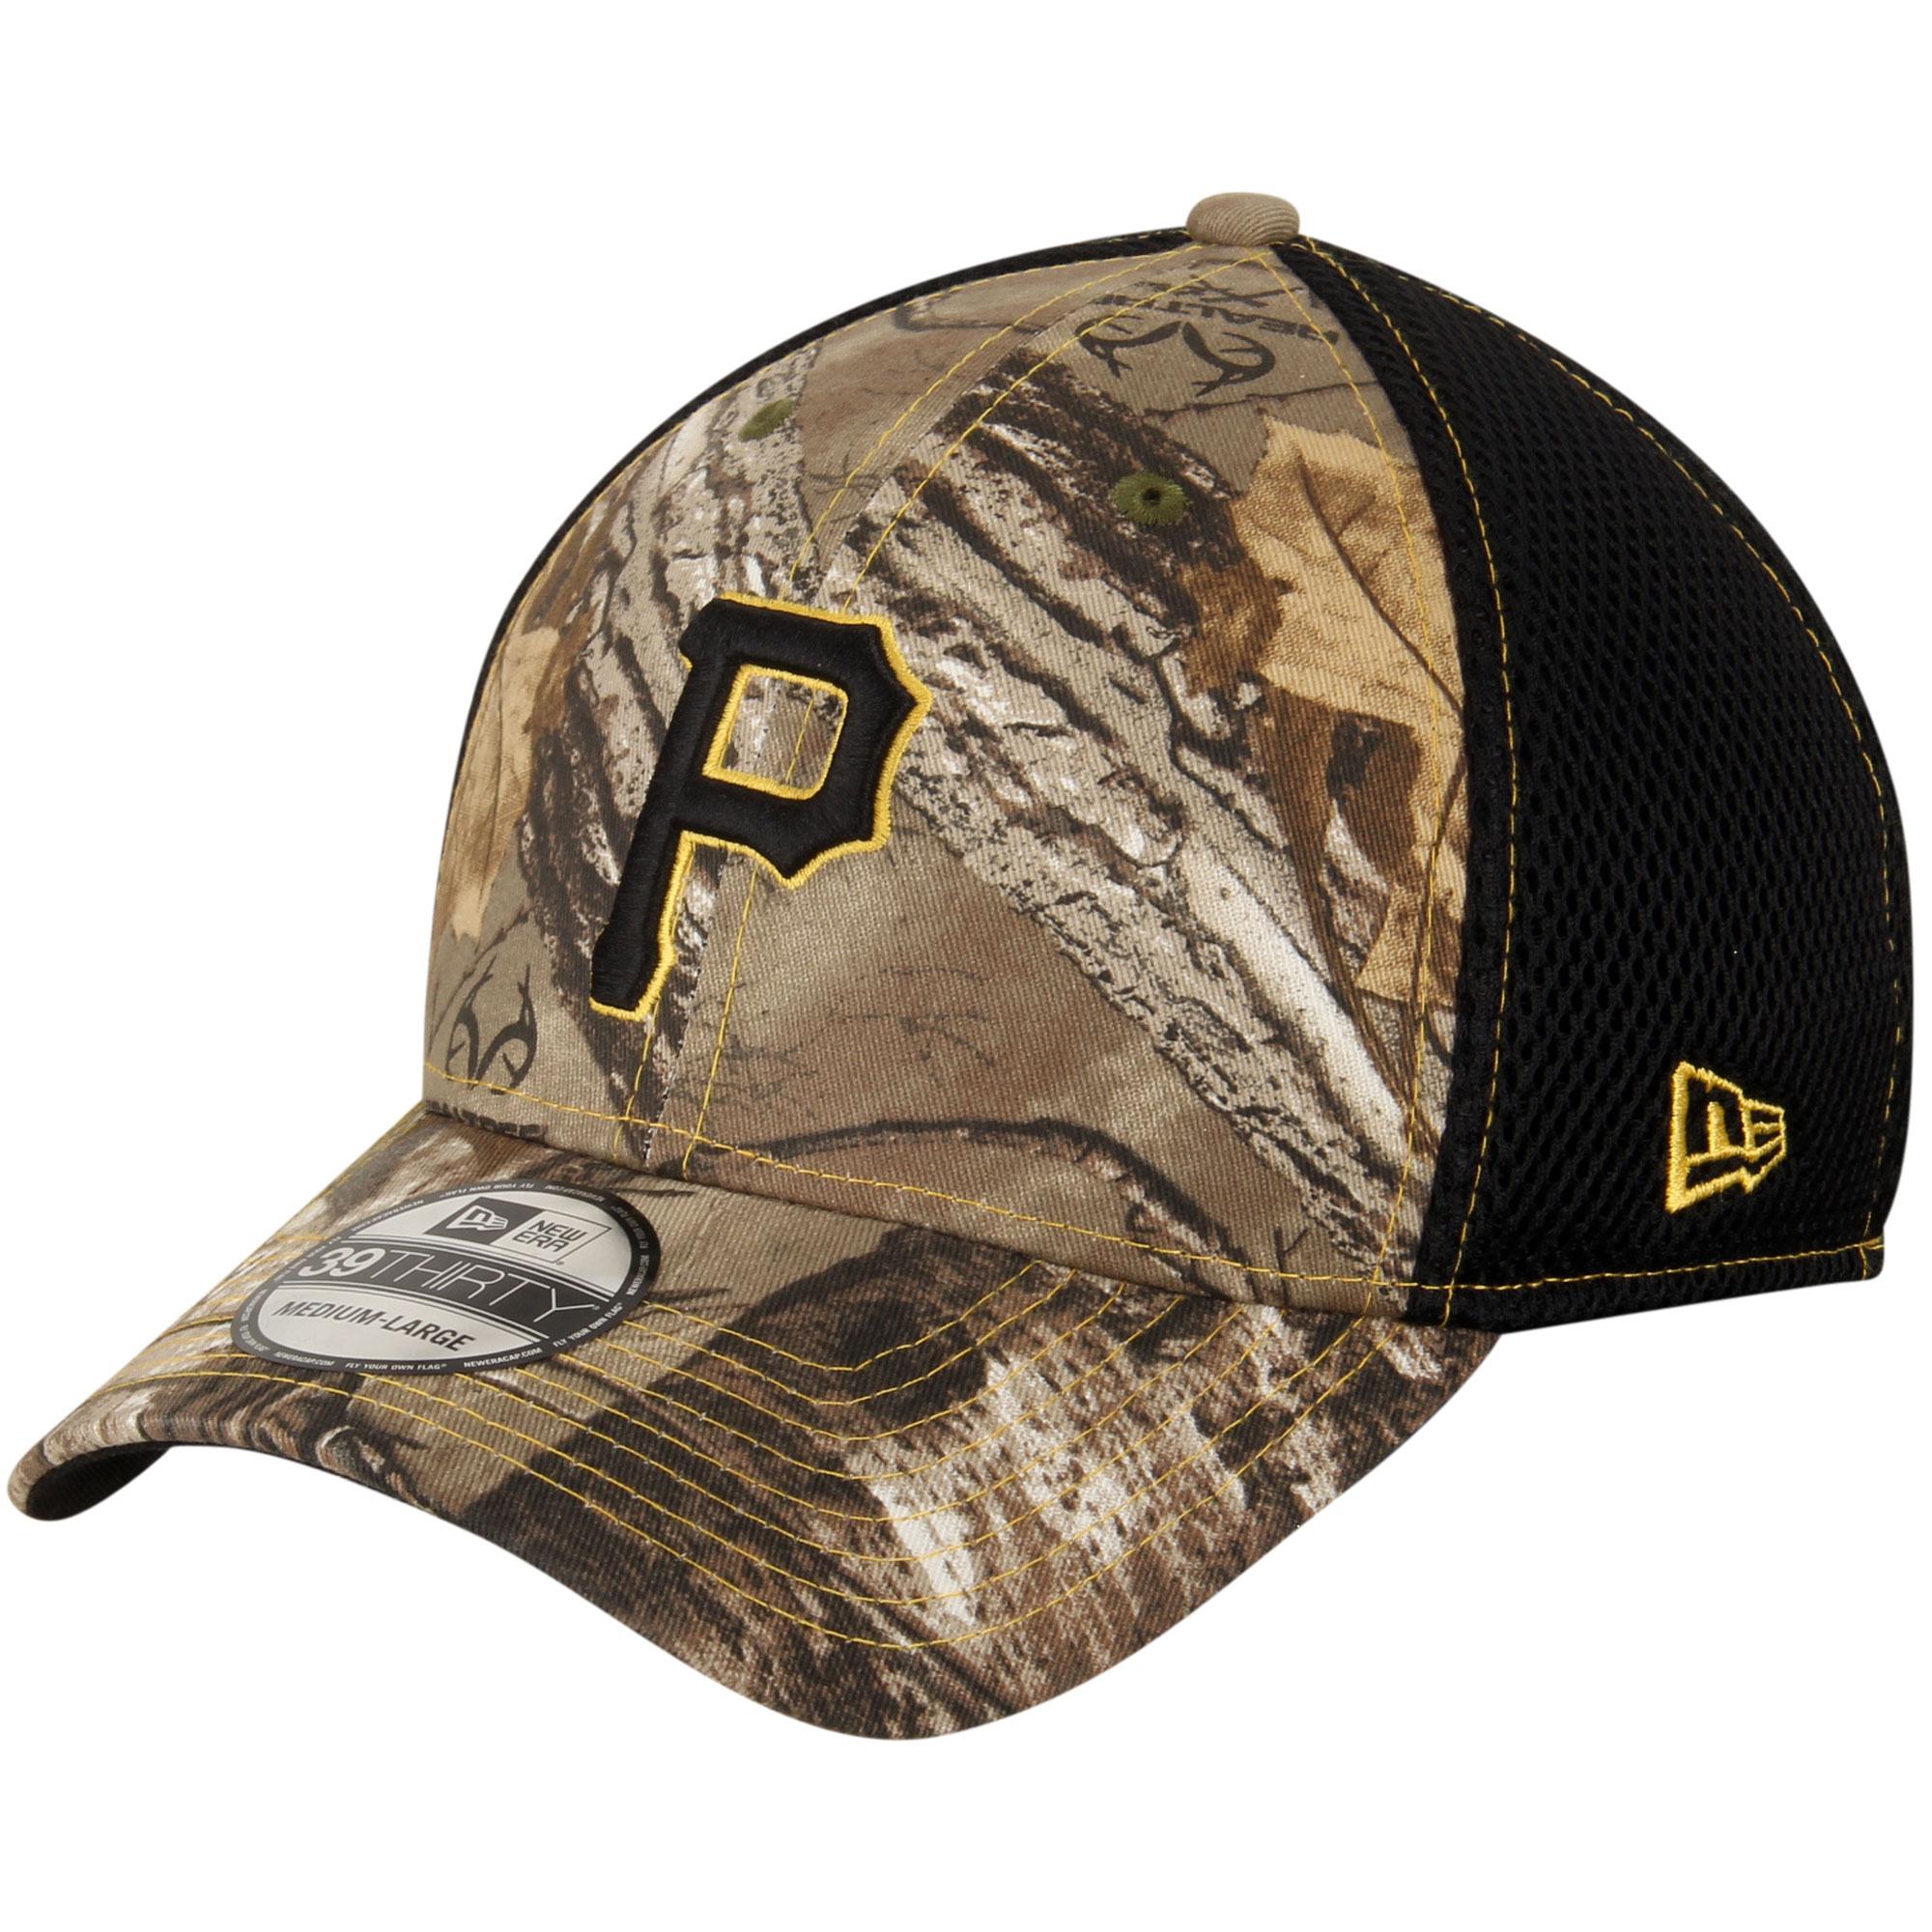 Pittsburgh Pirates New Era Neo 39THIRTY Flex Hat - Realtree Camo